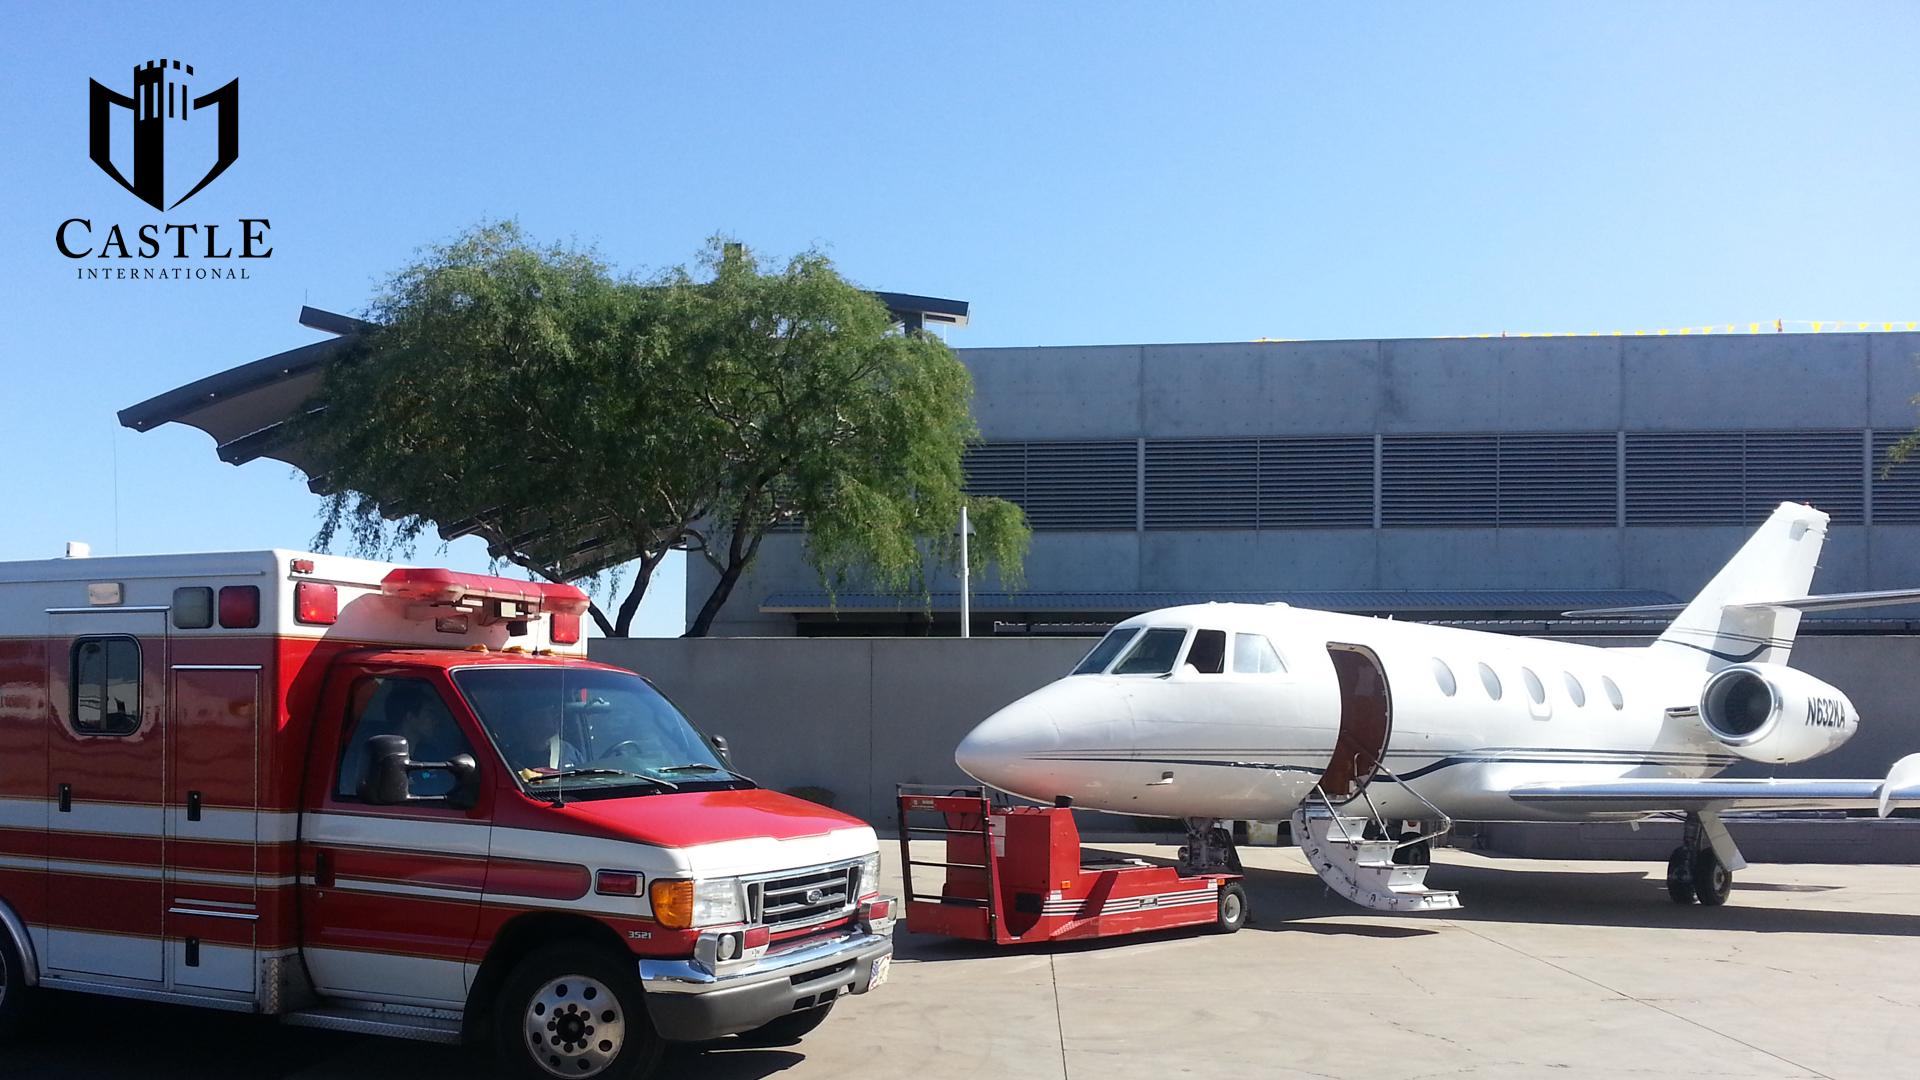 Castle_International_Air_Ambulance_MEDEVAC_2015a.017.jpg